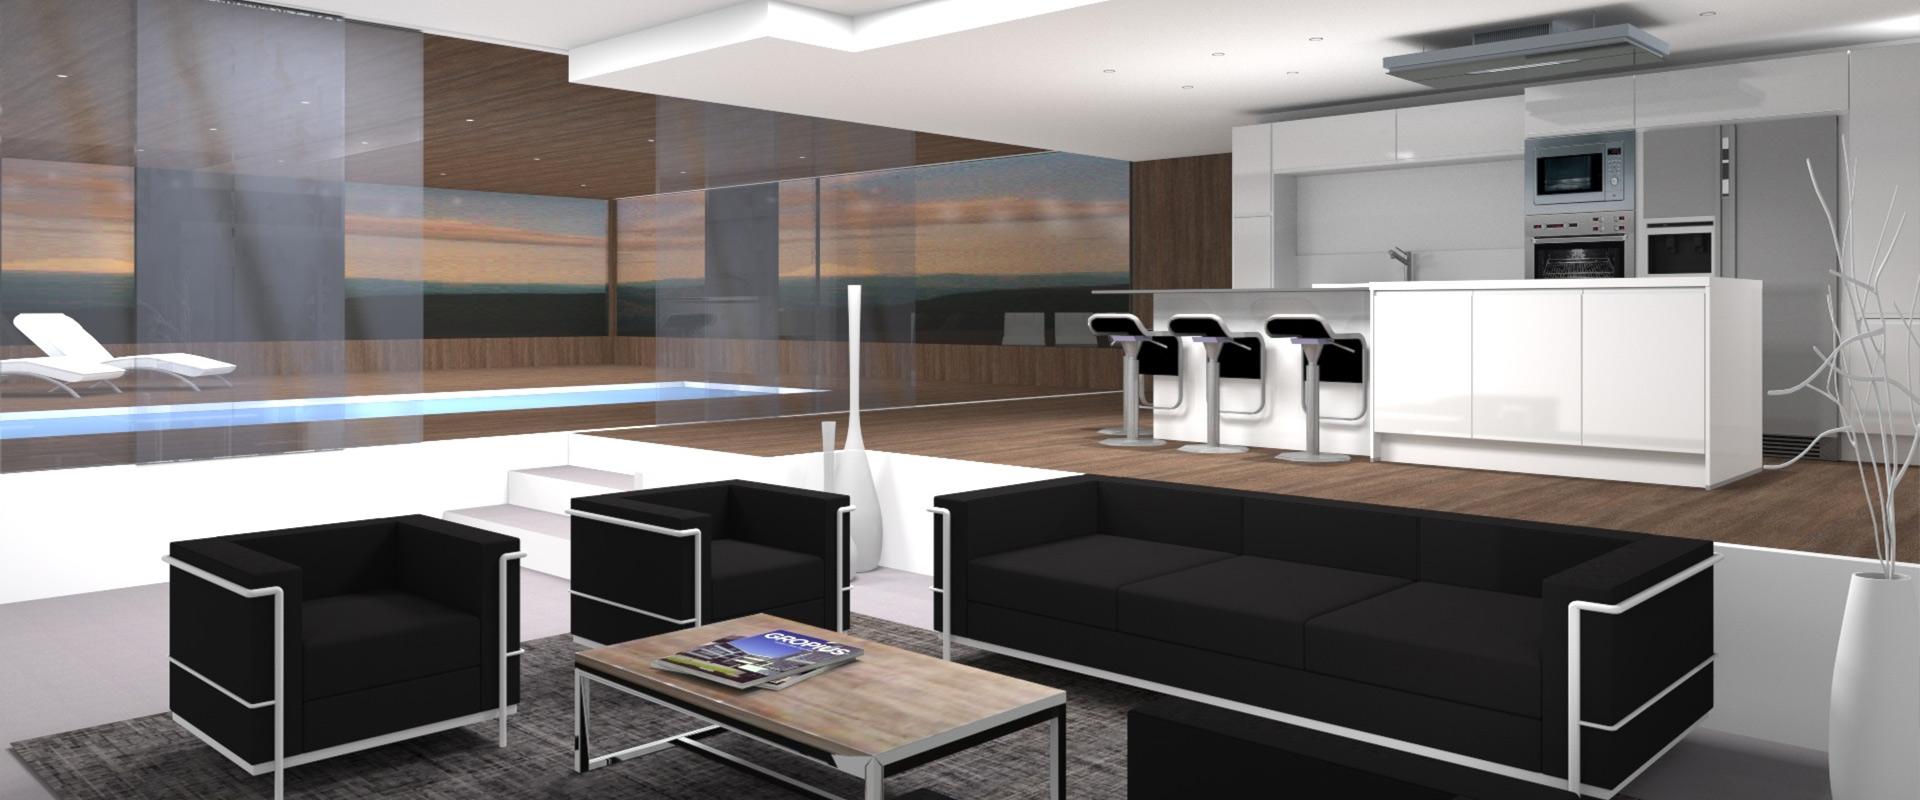 Concept Loft - Metro'nHome Grenoble